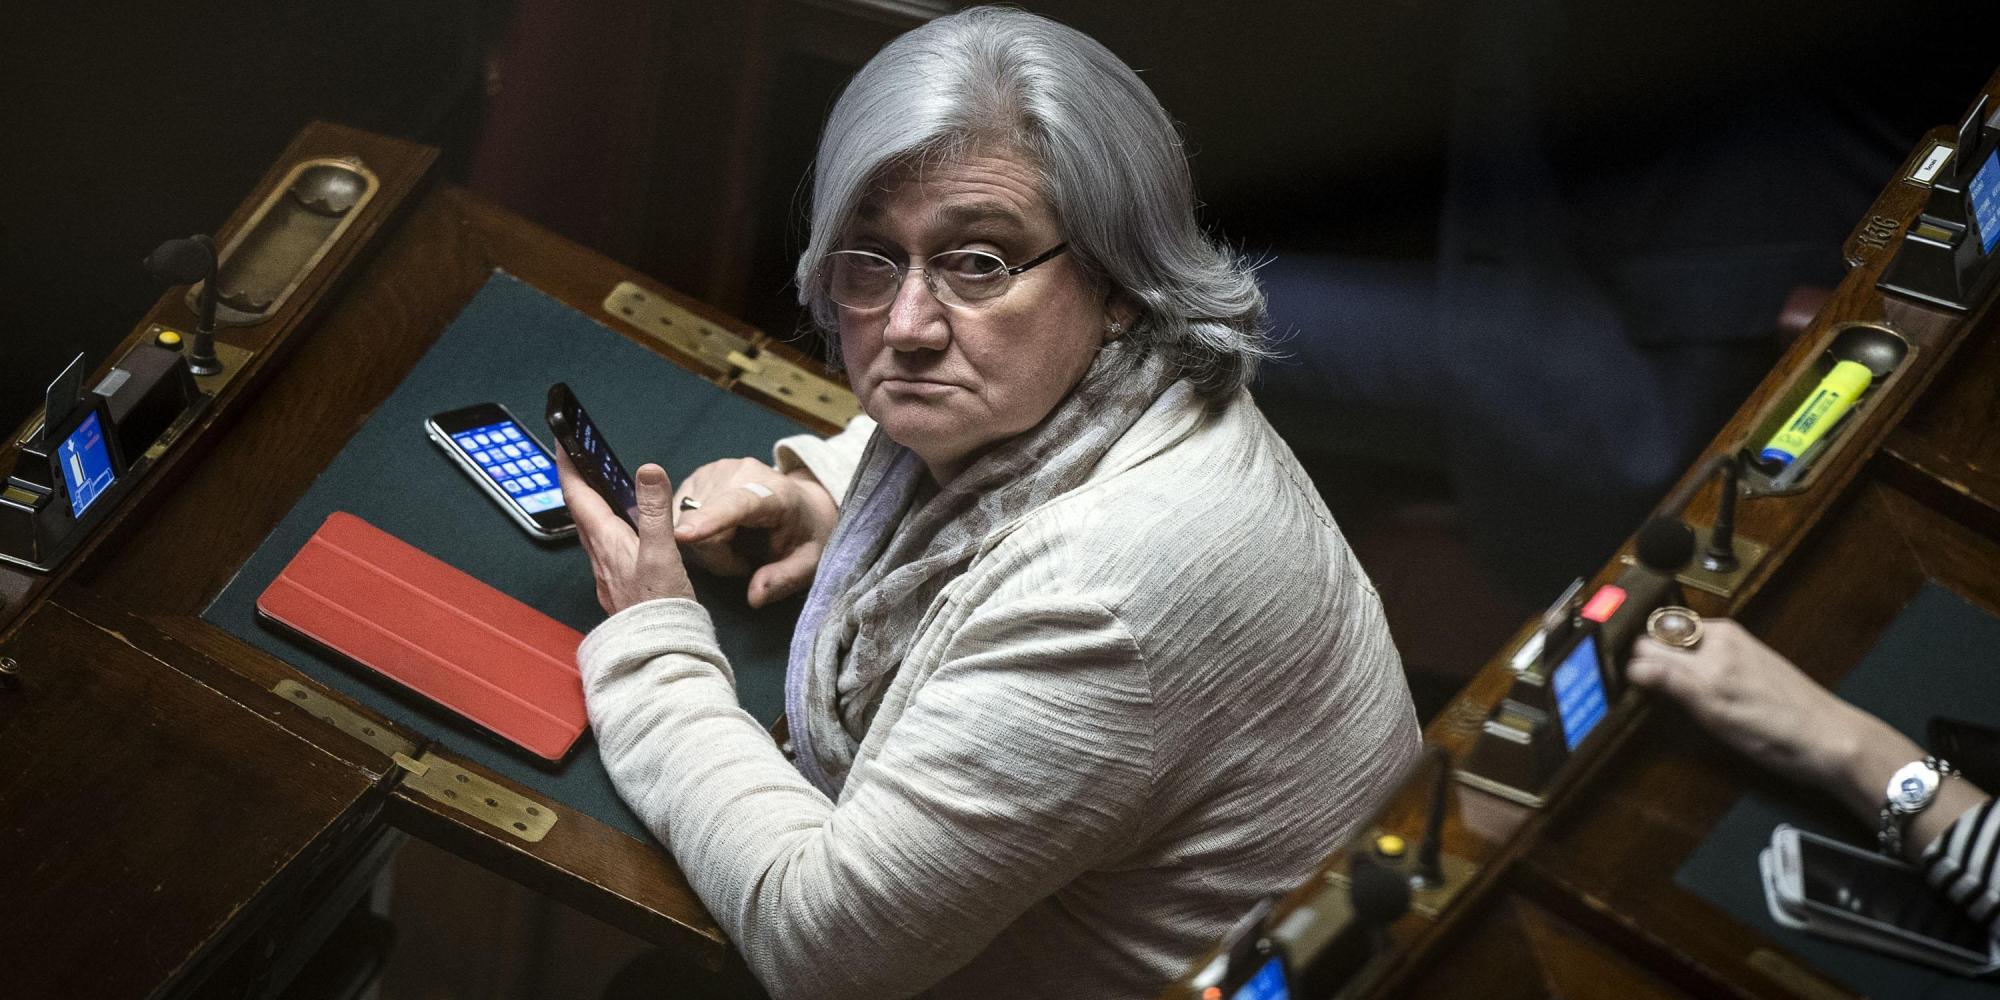 Italicum: Camera, Aula riprende esame testo,oggi voto finale